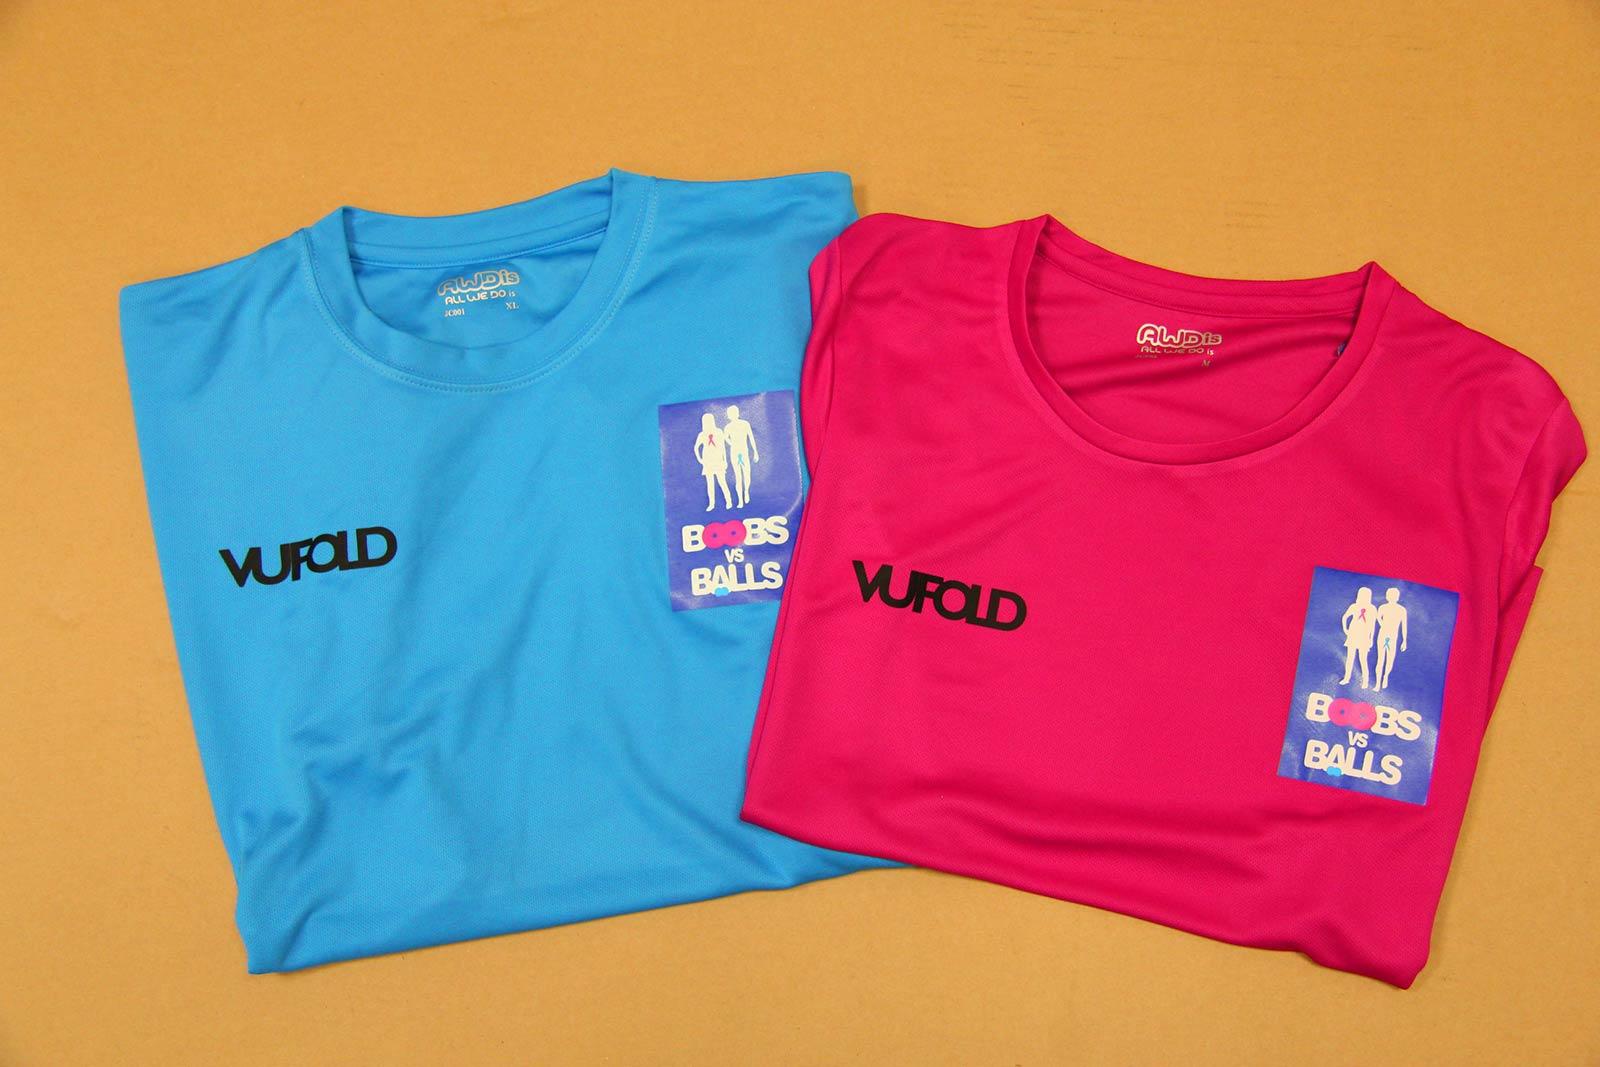 Vufold Sponsored Shirts